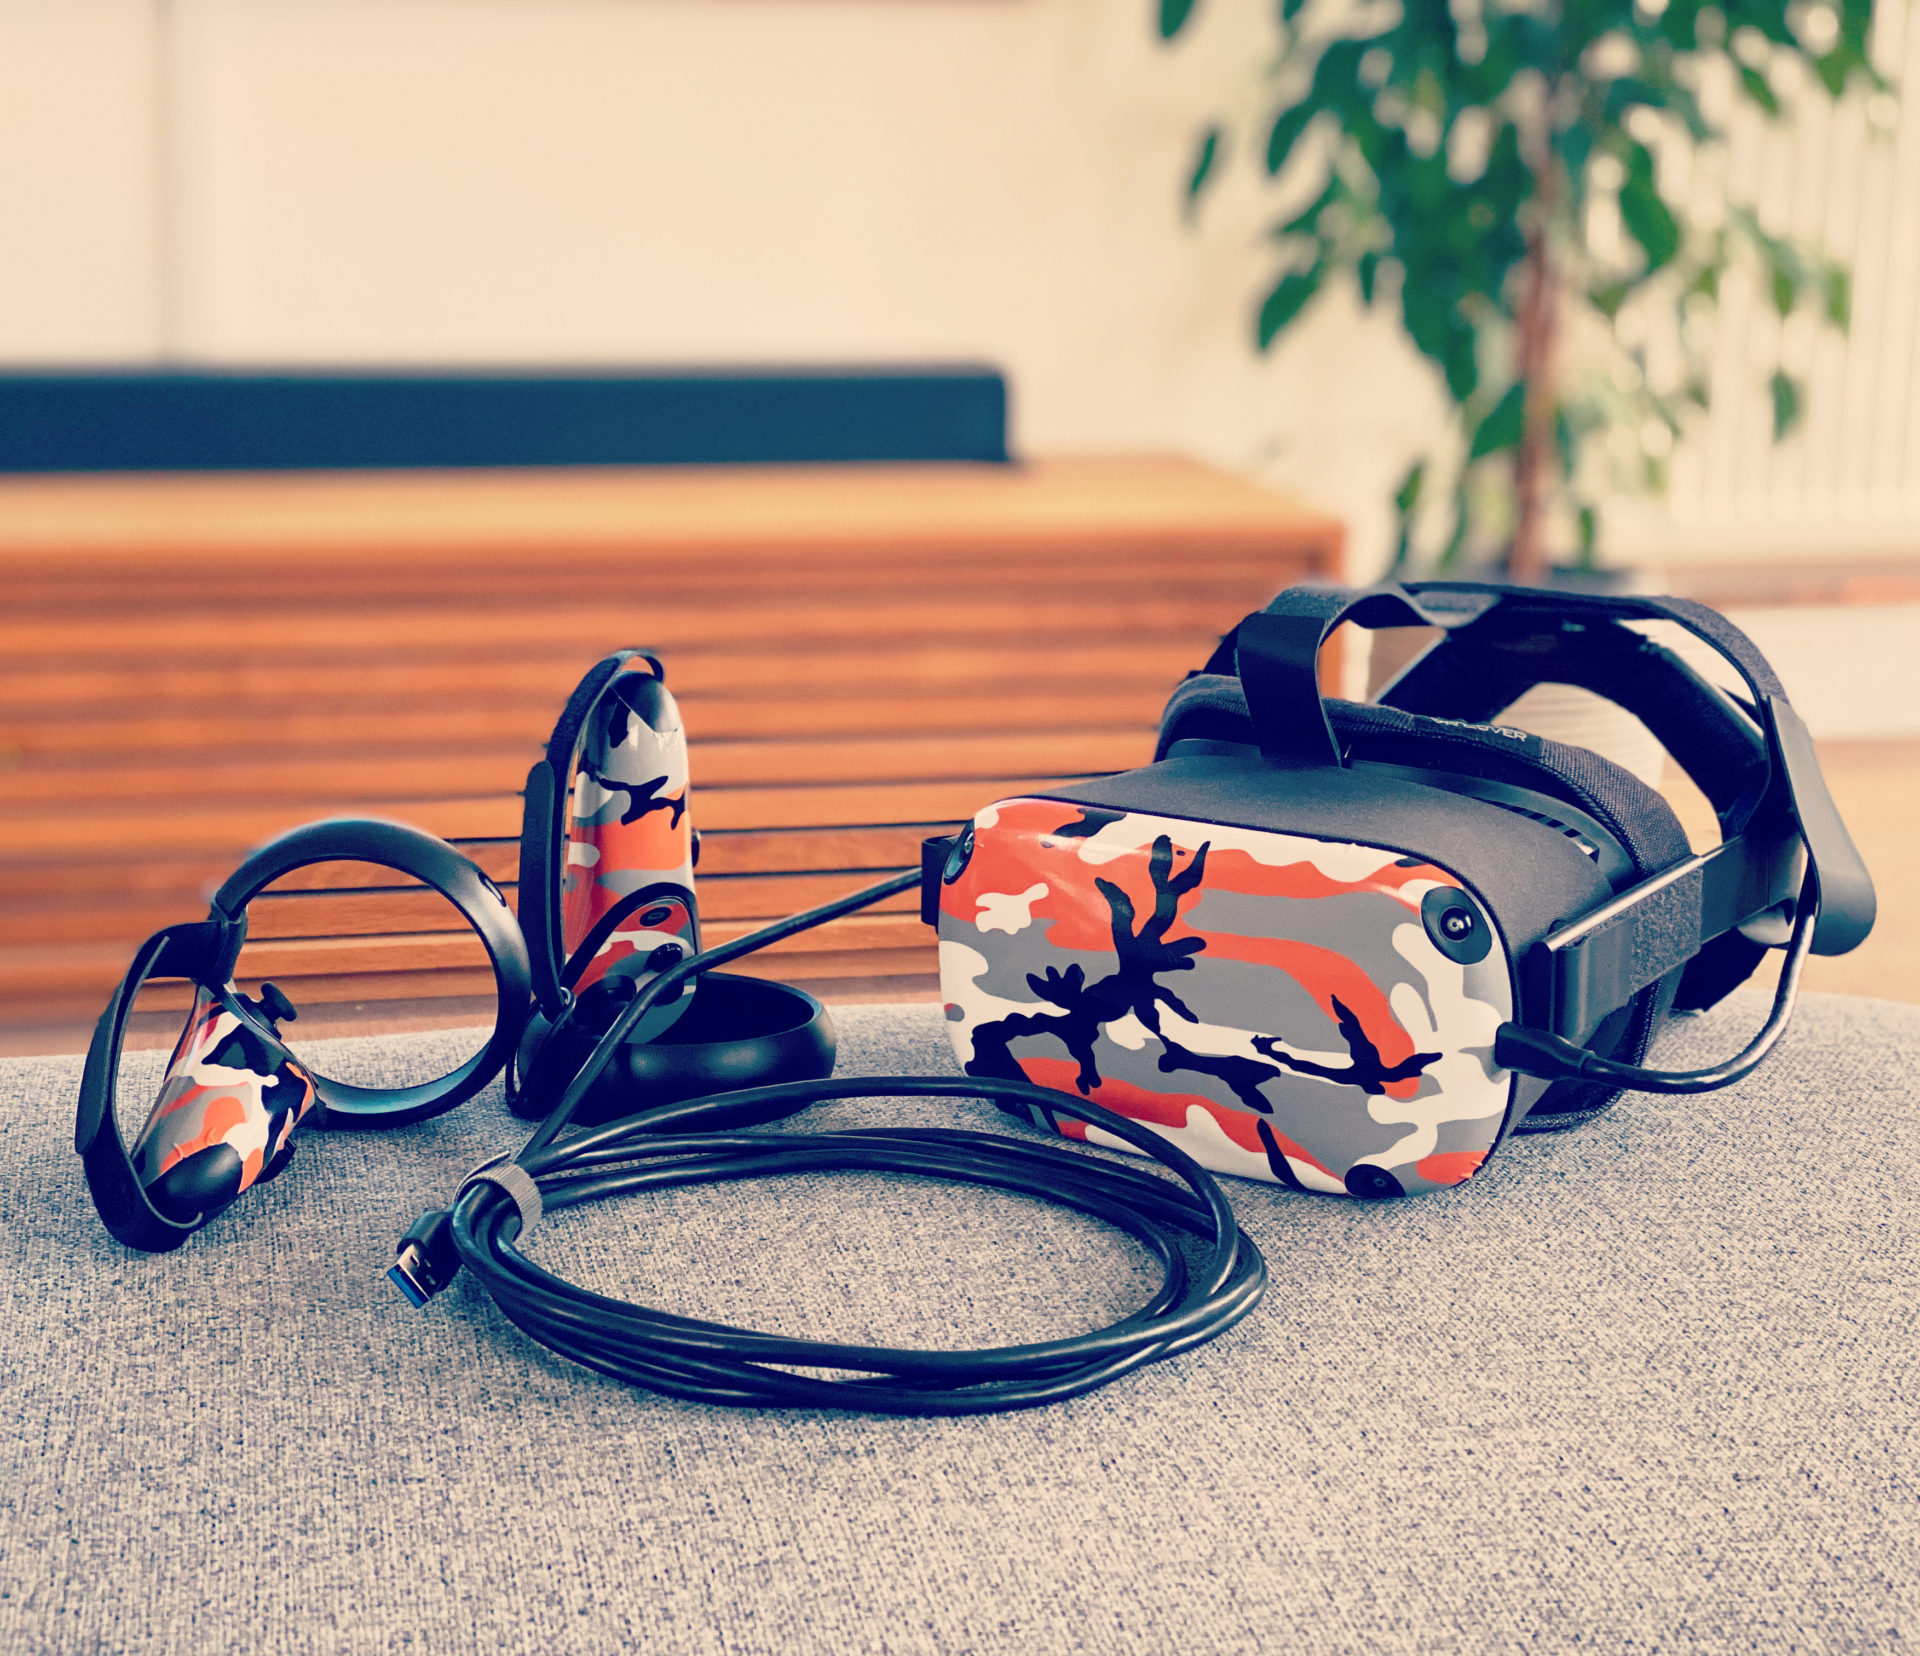 Alternative oculus link cable